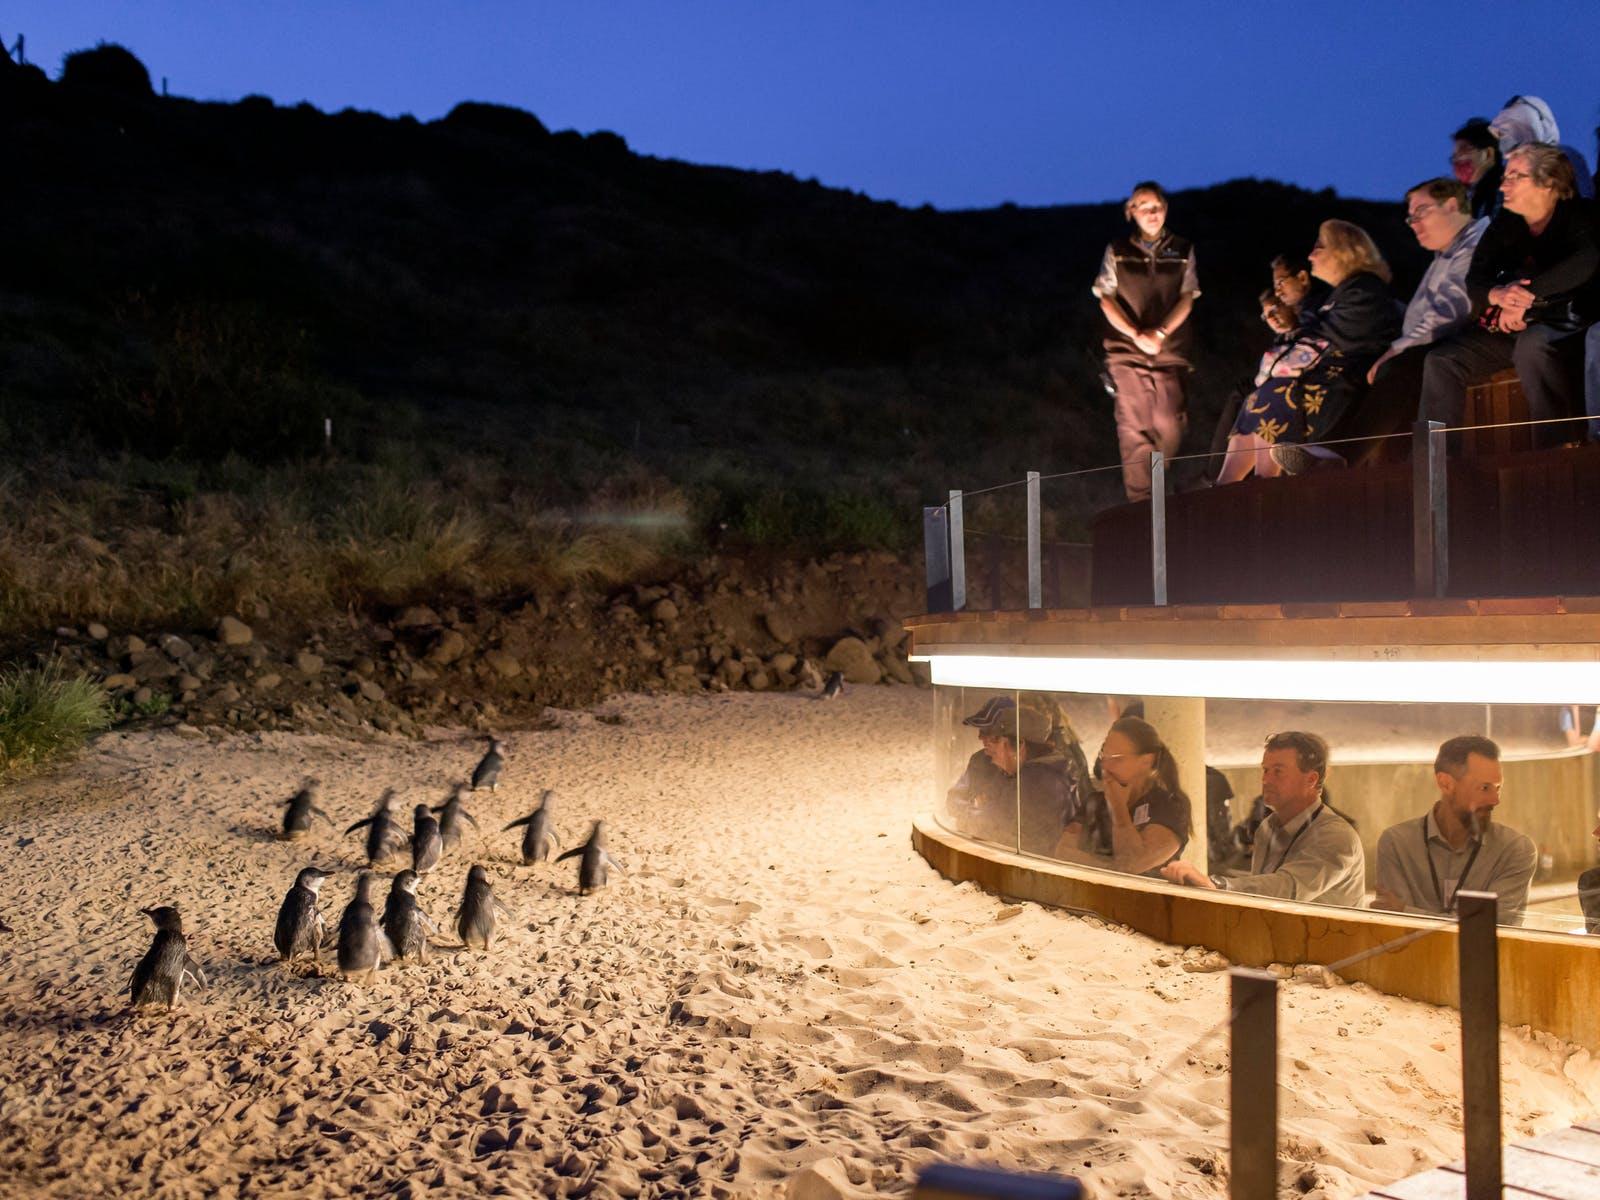 Penguin Parade Phillip Island Luxury Private Tour Express